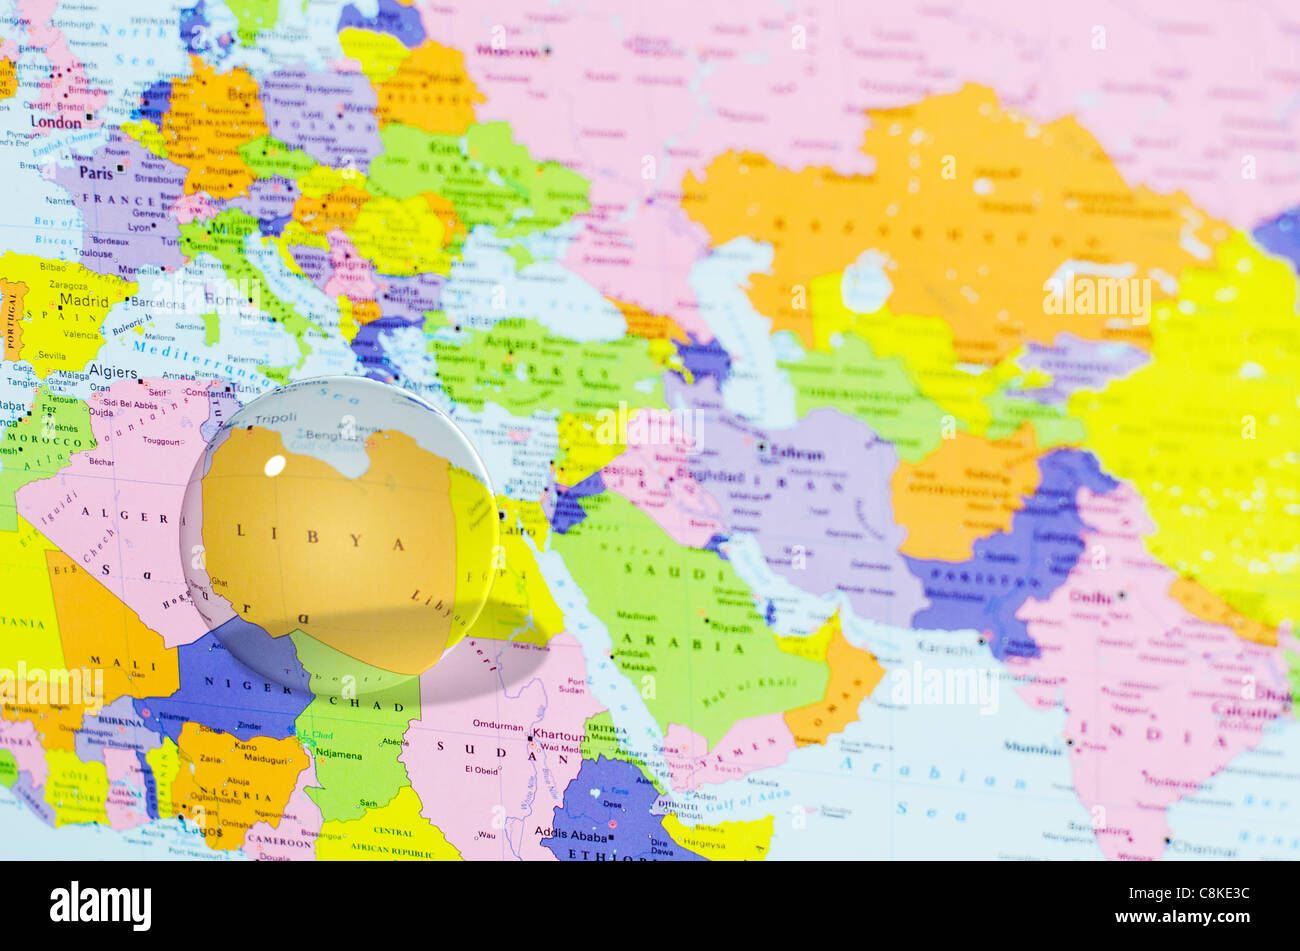 Crystal Ball Over Libya On World Map Stock Photo: 39766144 - Alamy